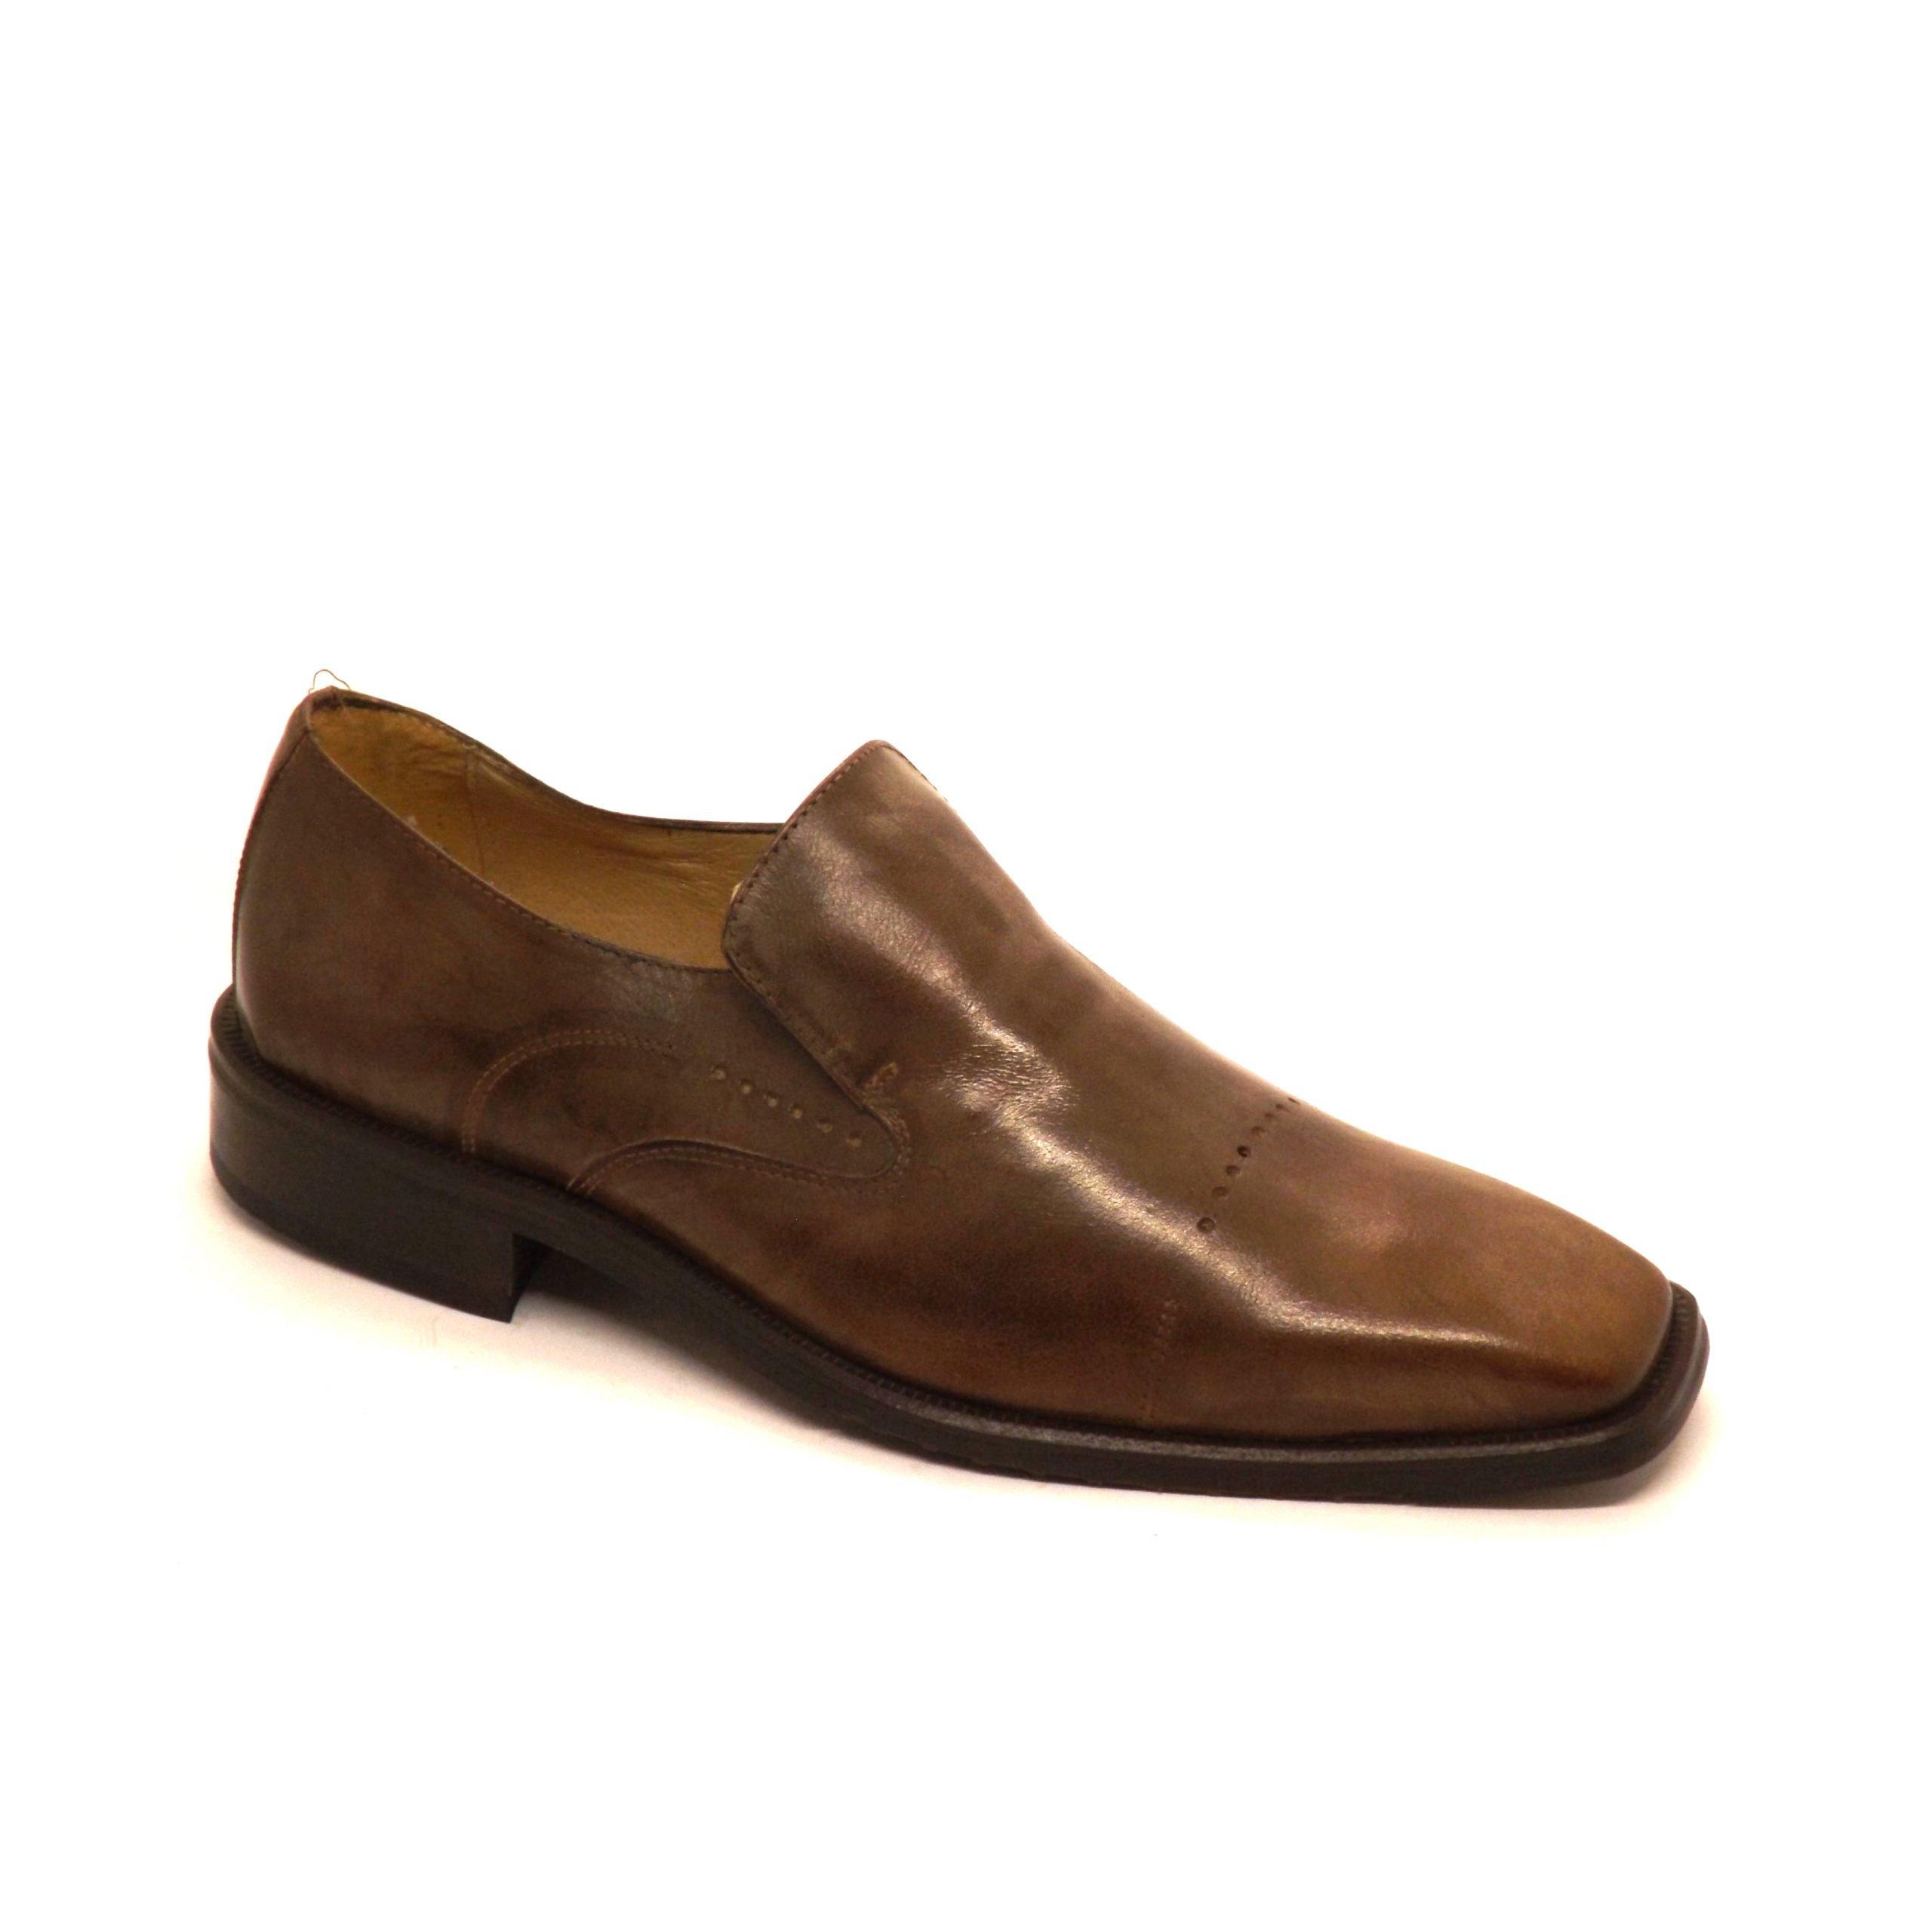 Zapato Kf Tolino envejecido